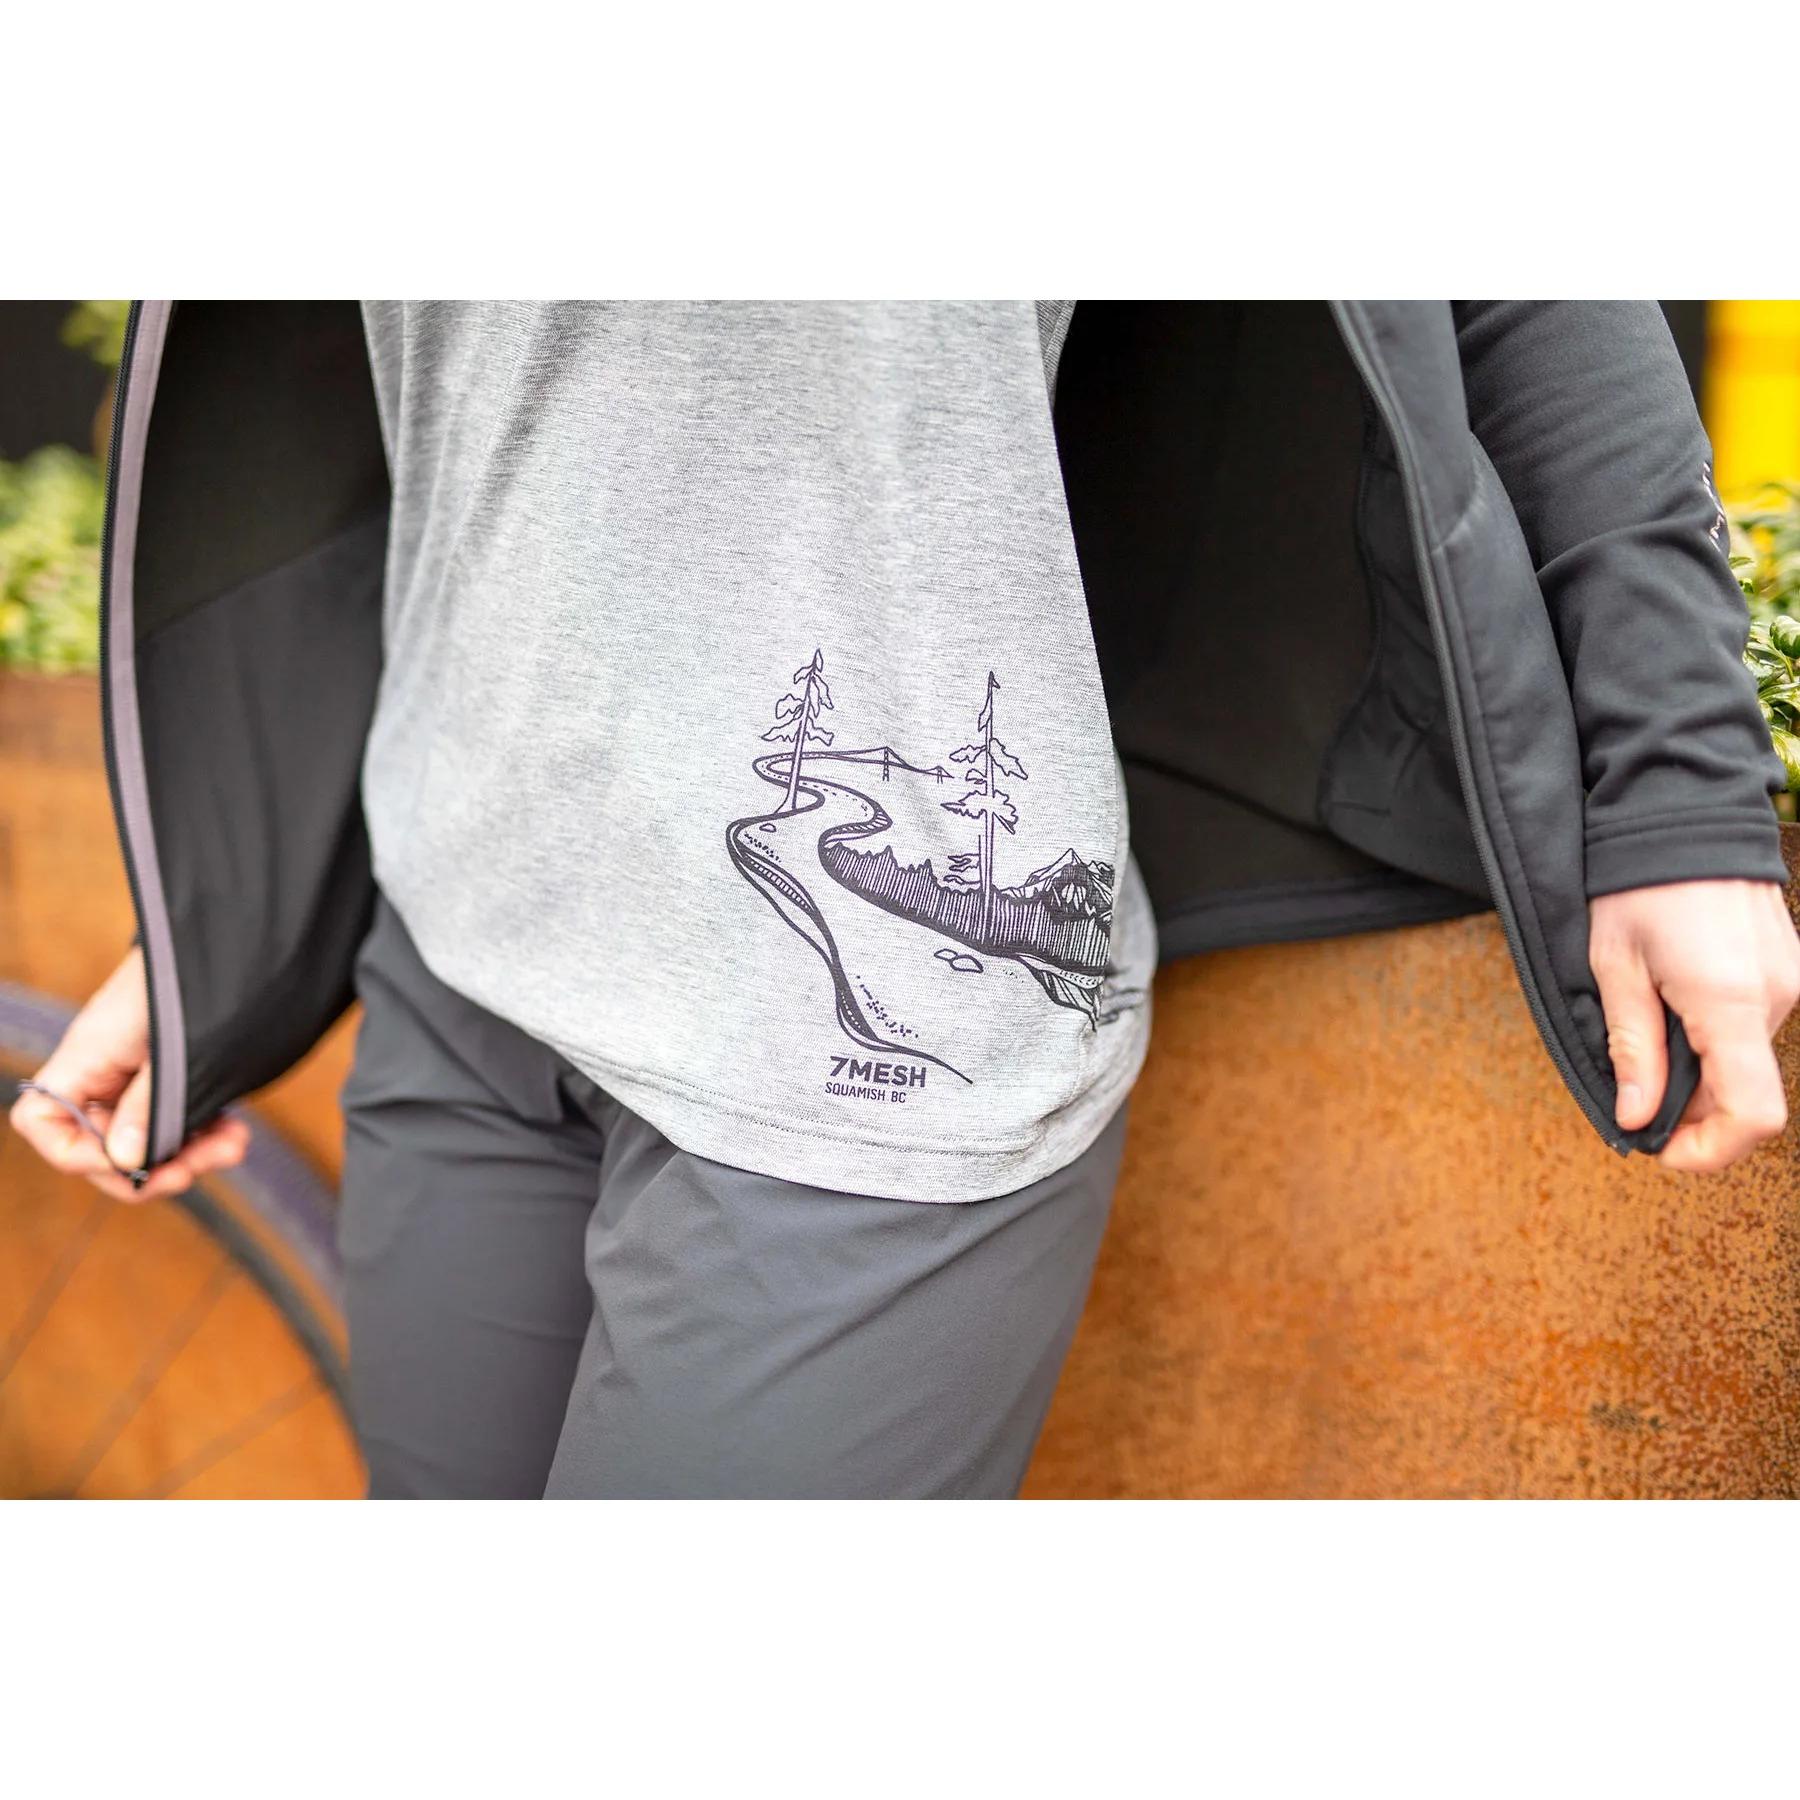 Imagen de 7mesh Elevate Bike Camiseta para mujer - Kate Zessel Series - Pebble Grey